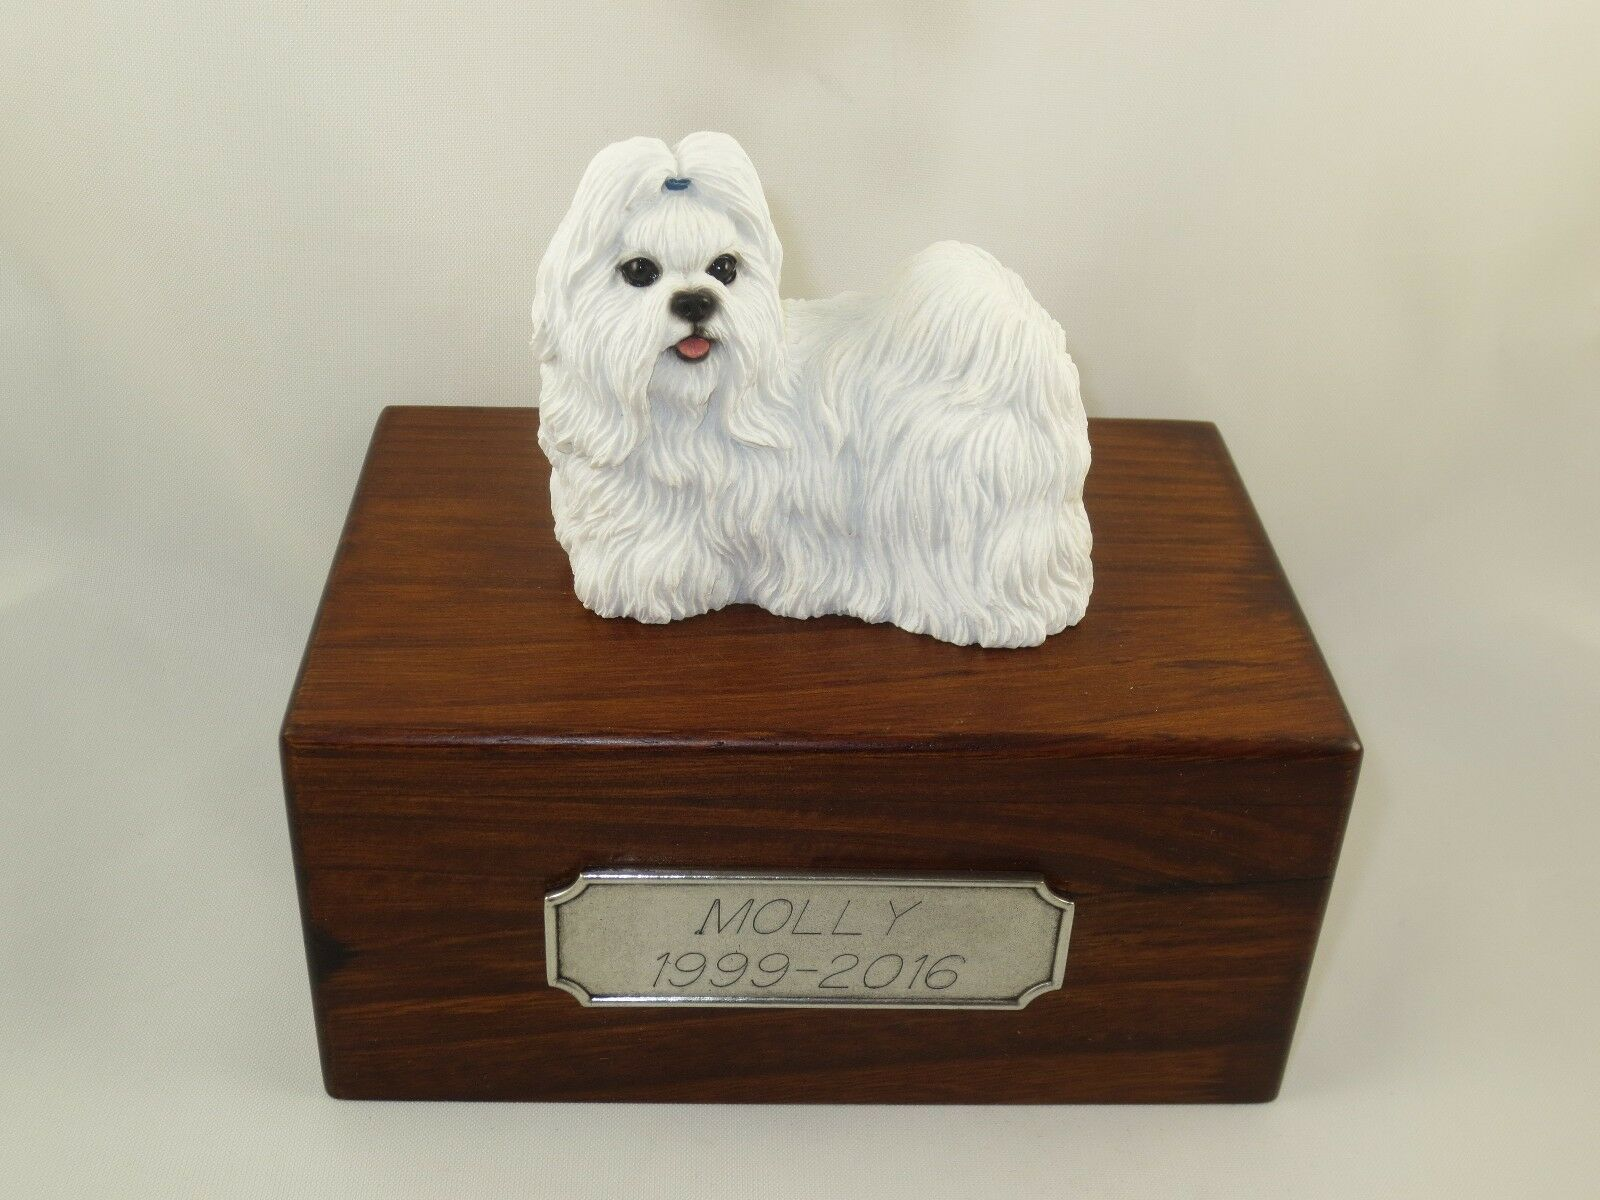 caldo Beautiful Paulownia Small Wooden Personalized Urn With bianca bianca bianca Shih Tzu Figurine  risparmia fino al 70%